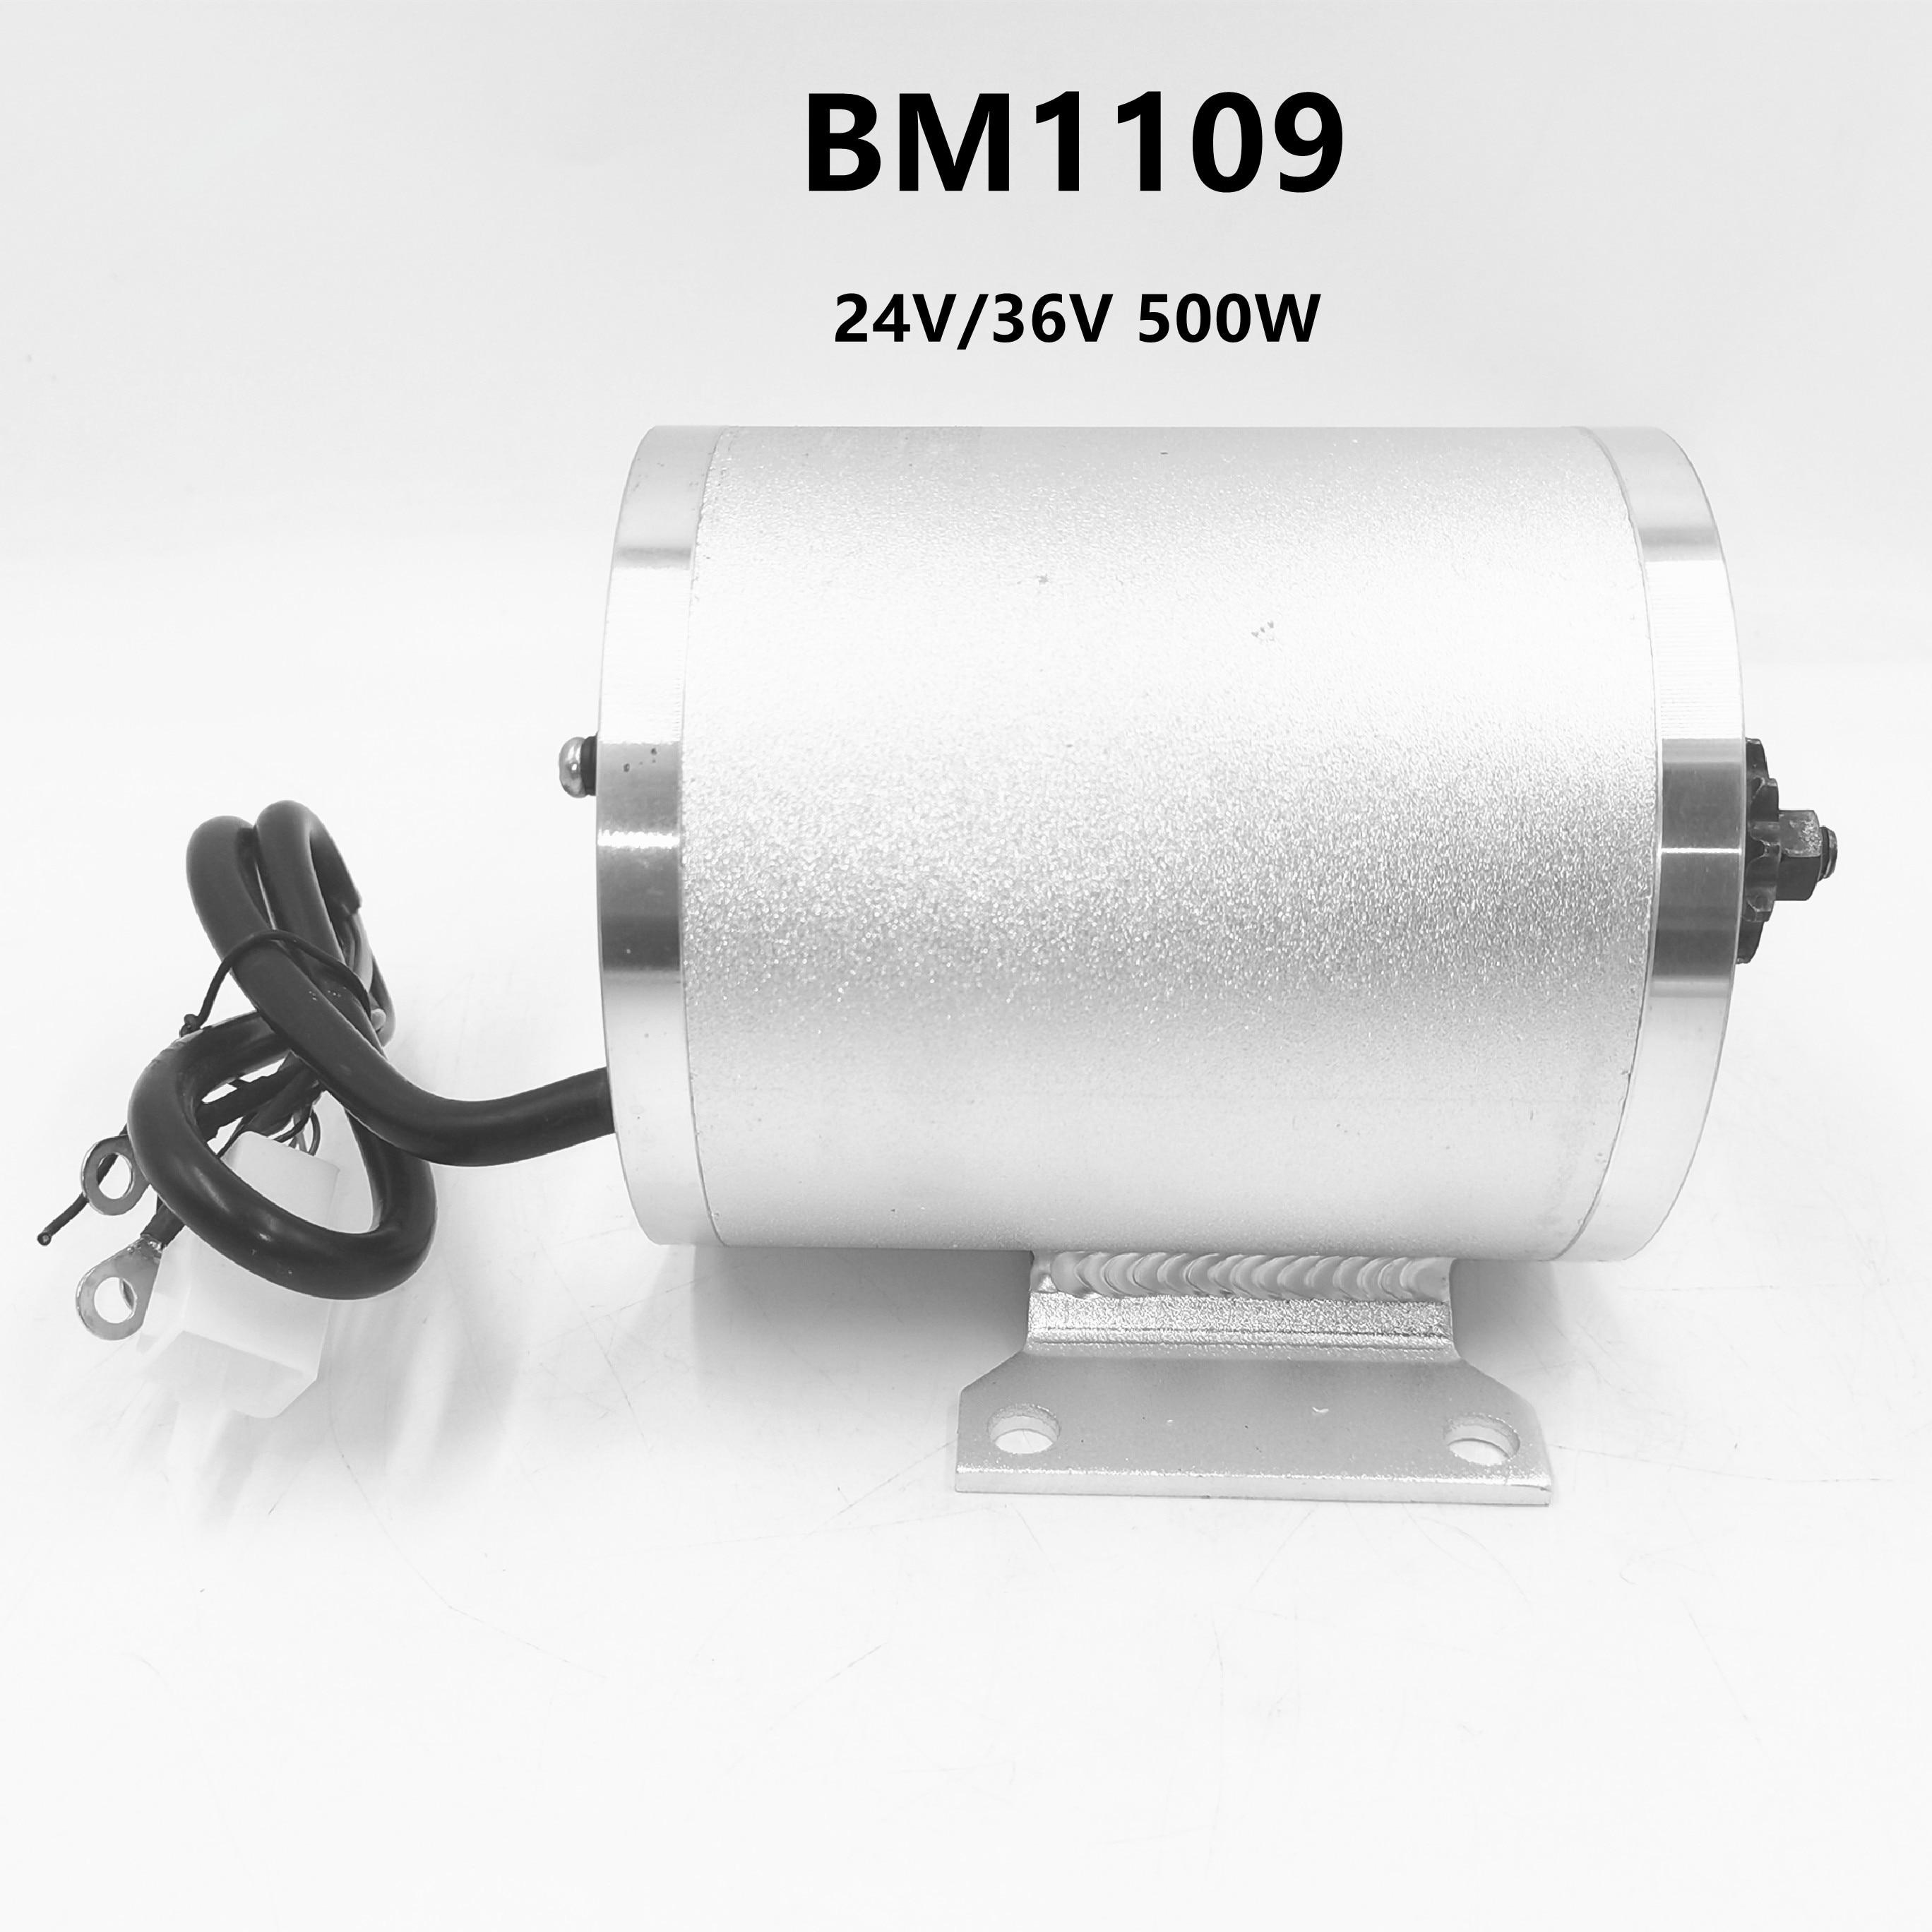 BM1109-محرك كهربائي 500 واط ، 36 فولت ، 48 فولت ، بدون فرش ، سرعة عالية ، DIY ، تيار مستمر ، للعربة ، دراجة كهربائية ، التنقل ، تعديل السيارة